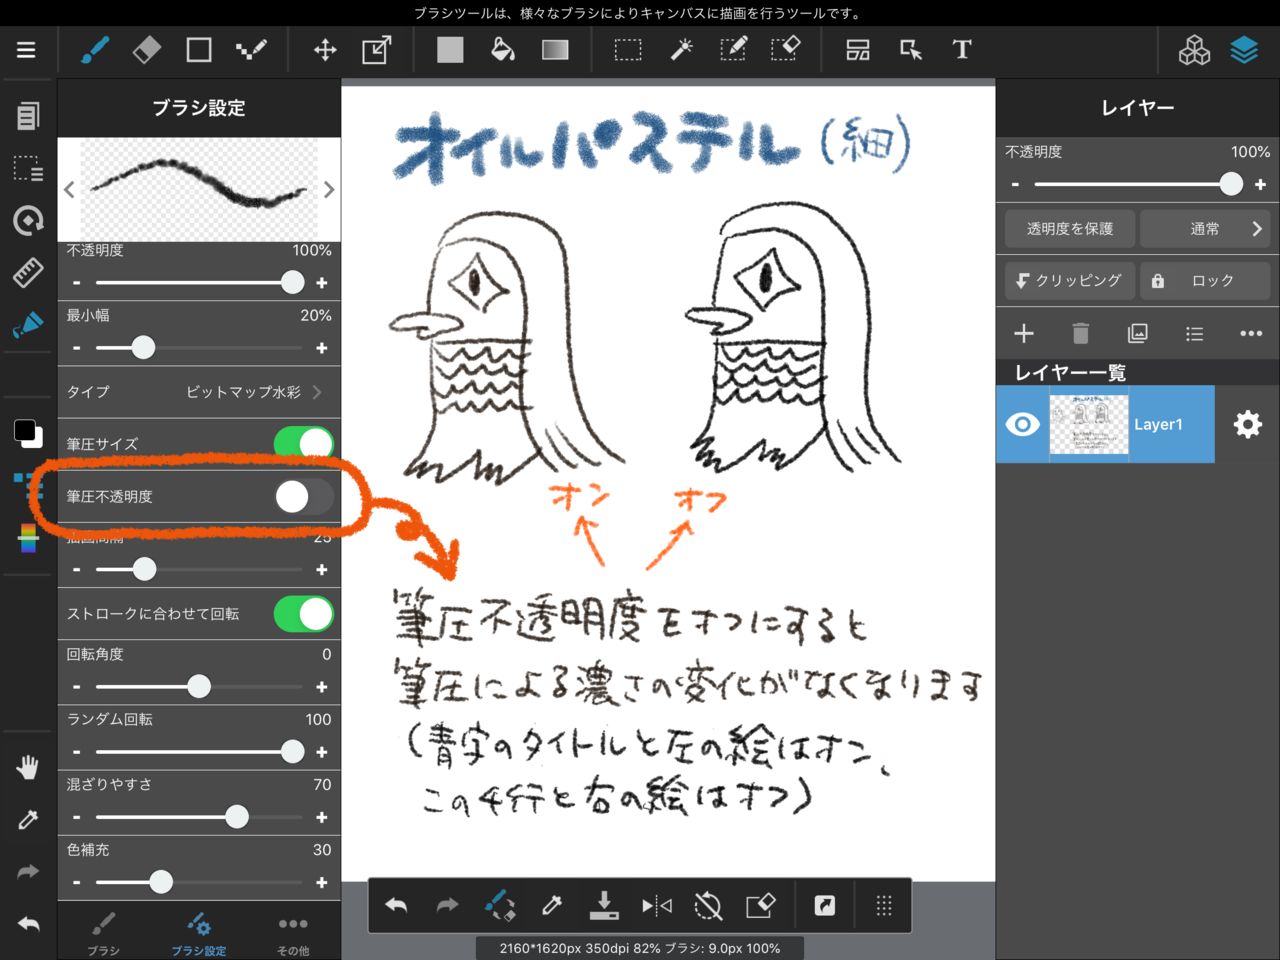 f:id:Imamura:20200421205440p:plain